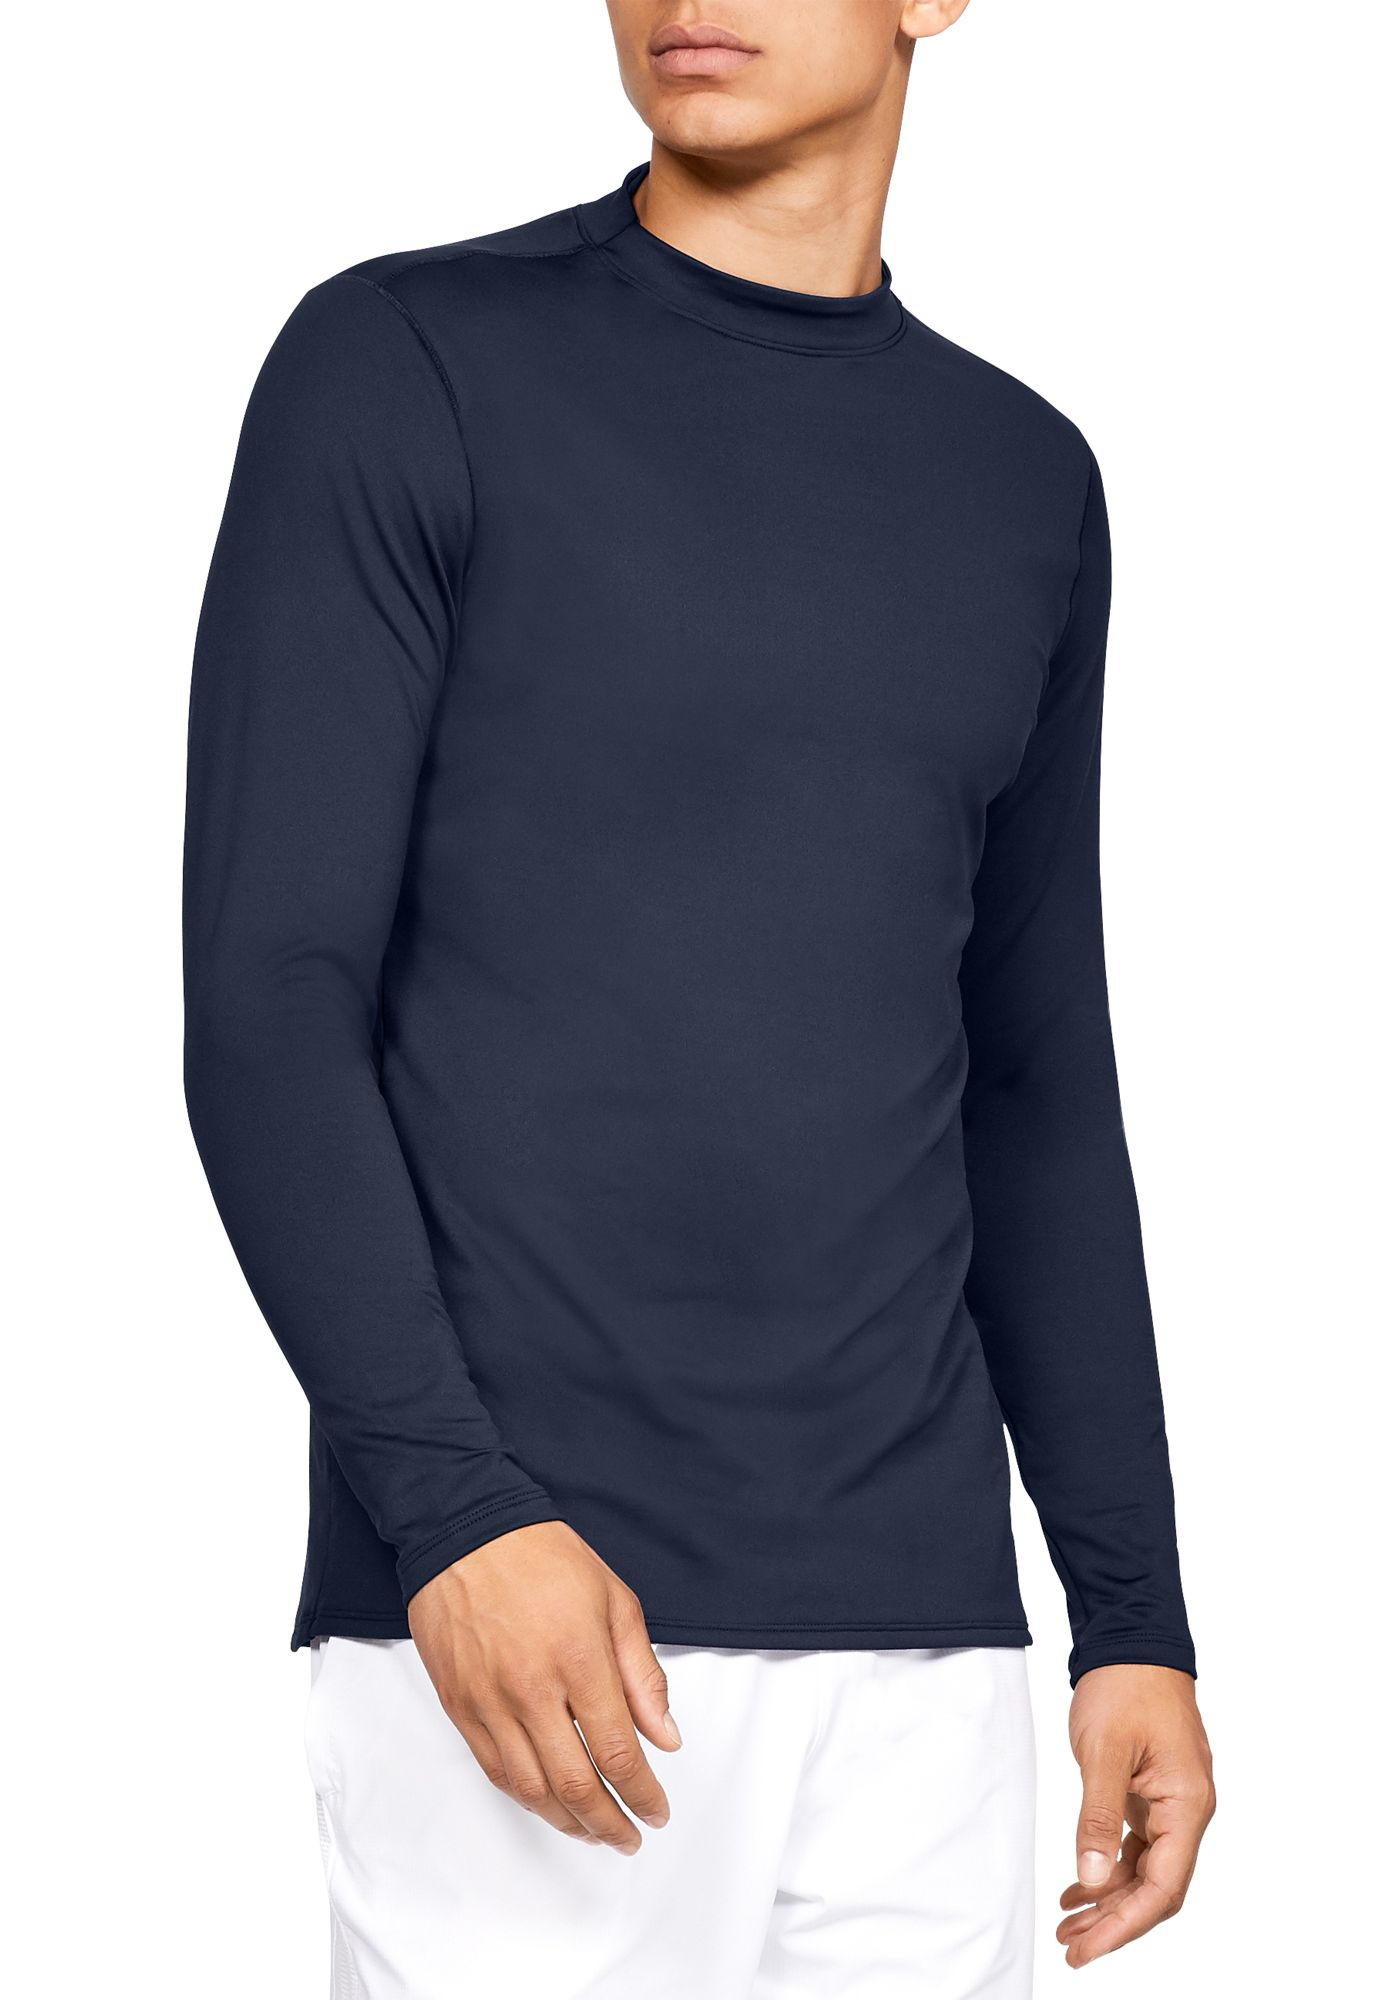 Under Armour Men's ColdGear Armour Mock Neck Long Sleeve Shirt (Regular and Big & Tall)